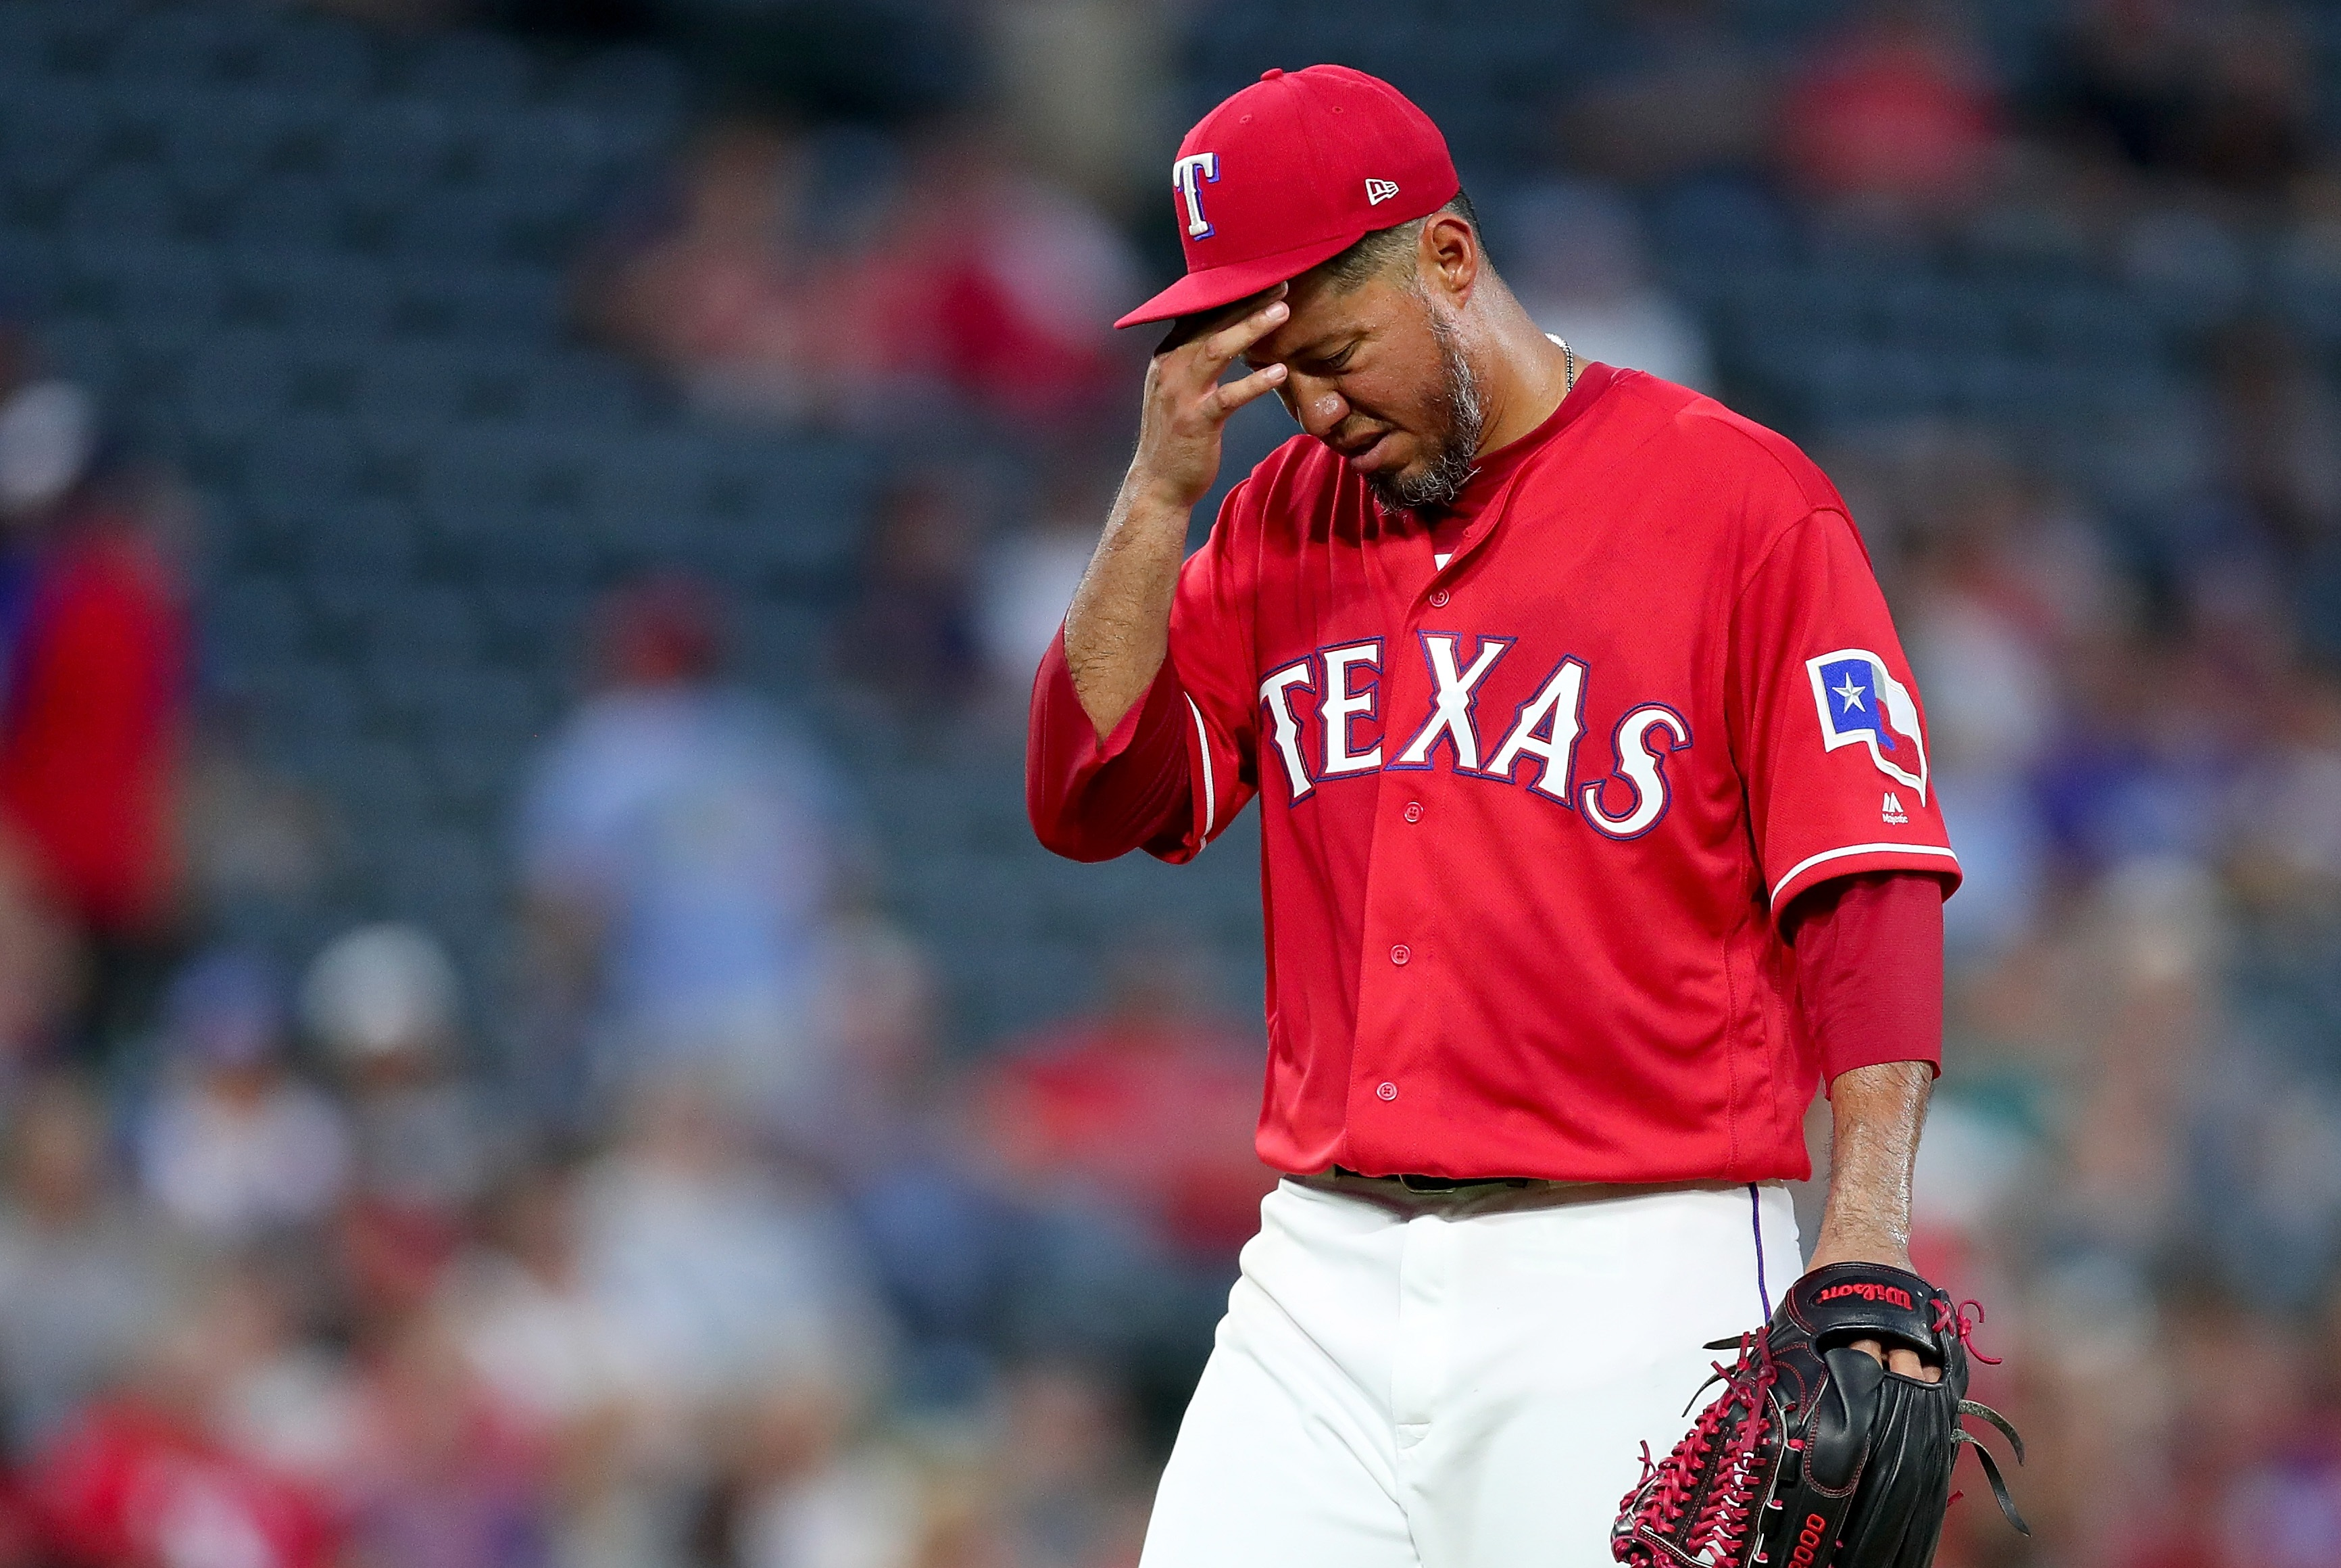 Yovani Gallardo helpedbandage the Rangers' rotation. But how long will Texas keep him around?